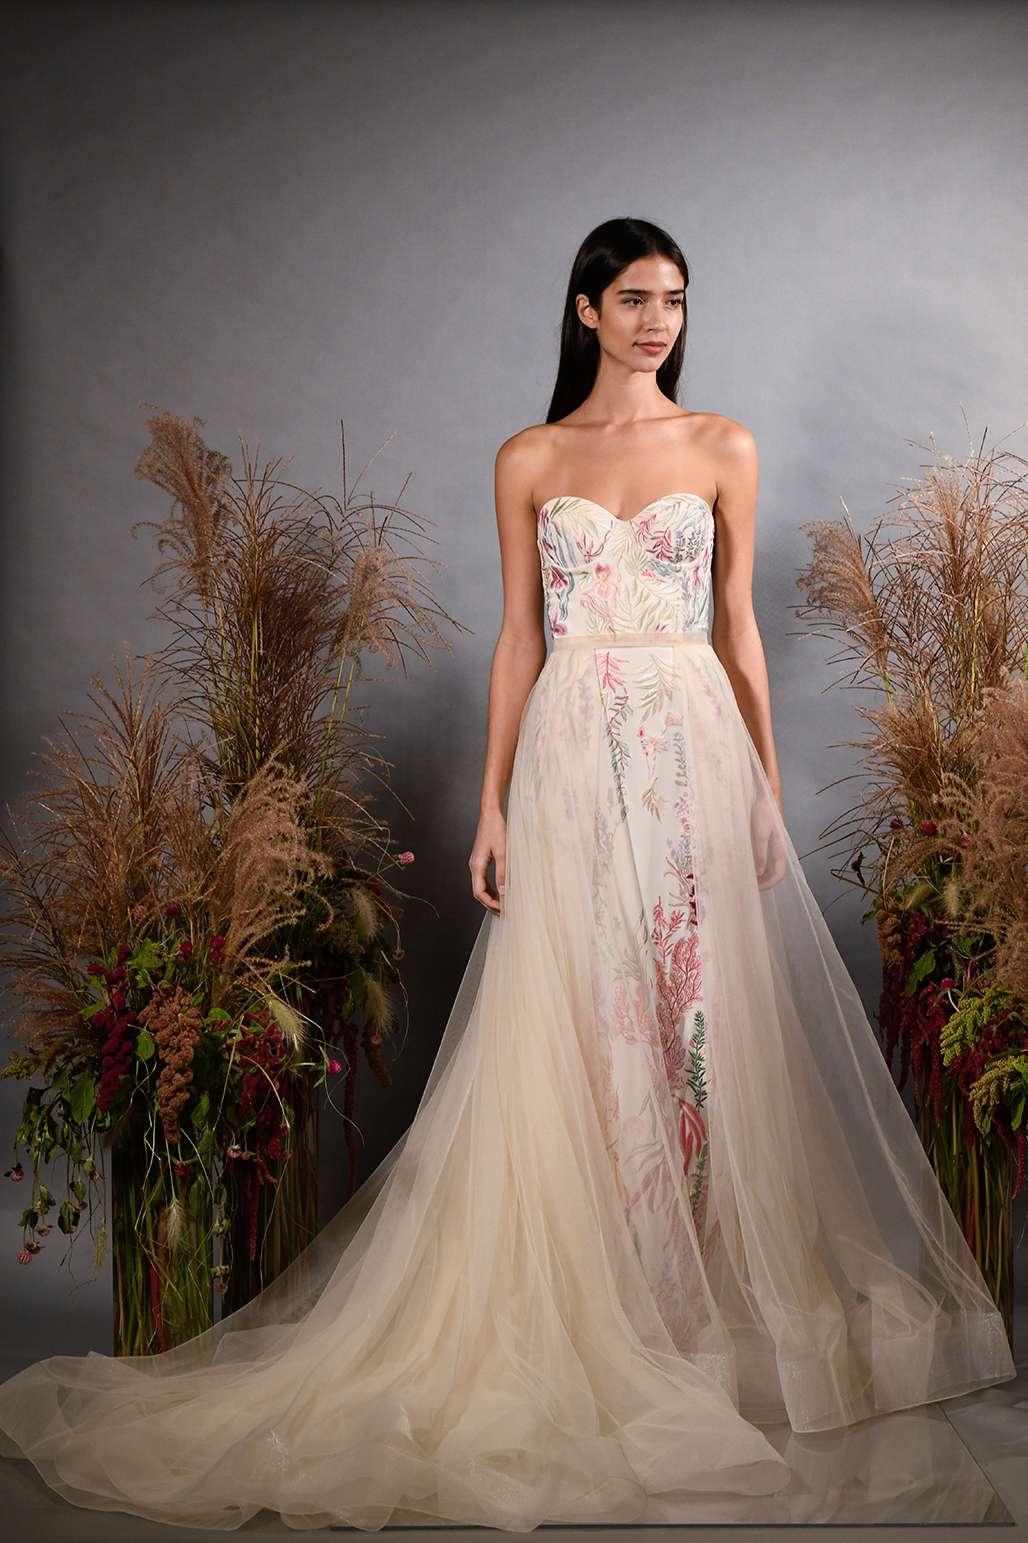 Model in strapless sweetheart wedding dress with overskirt